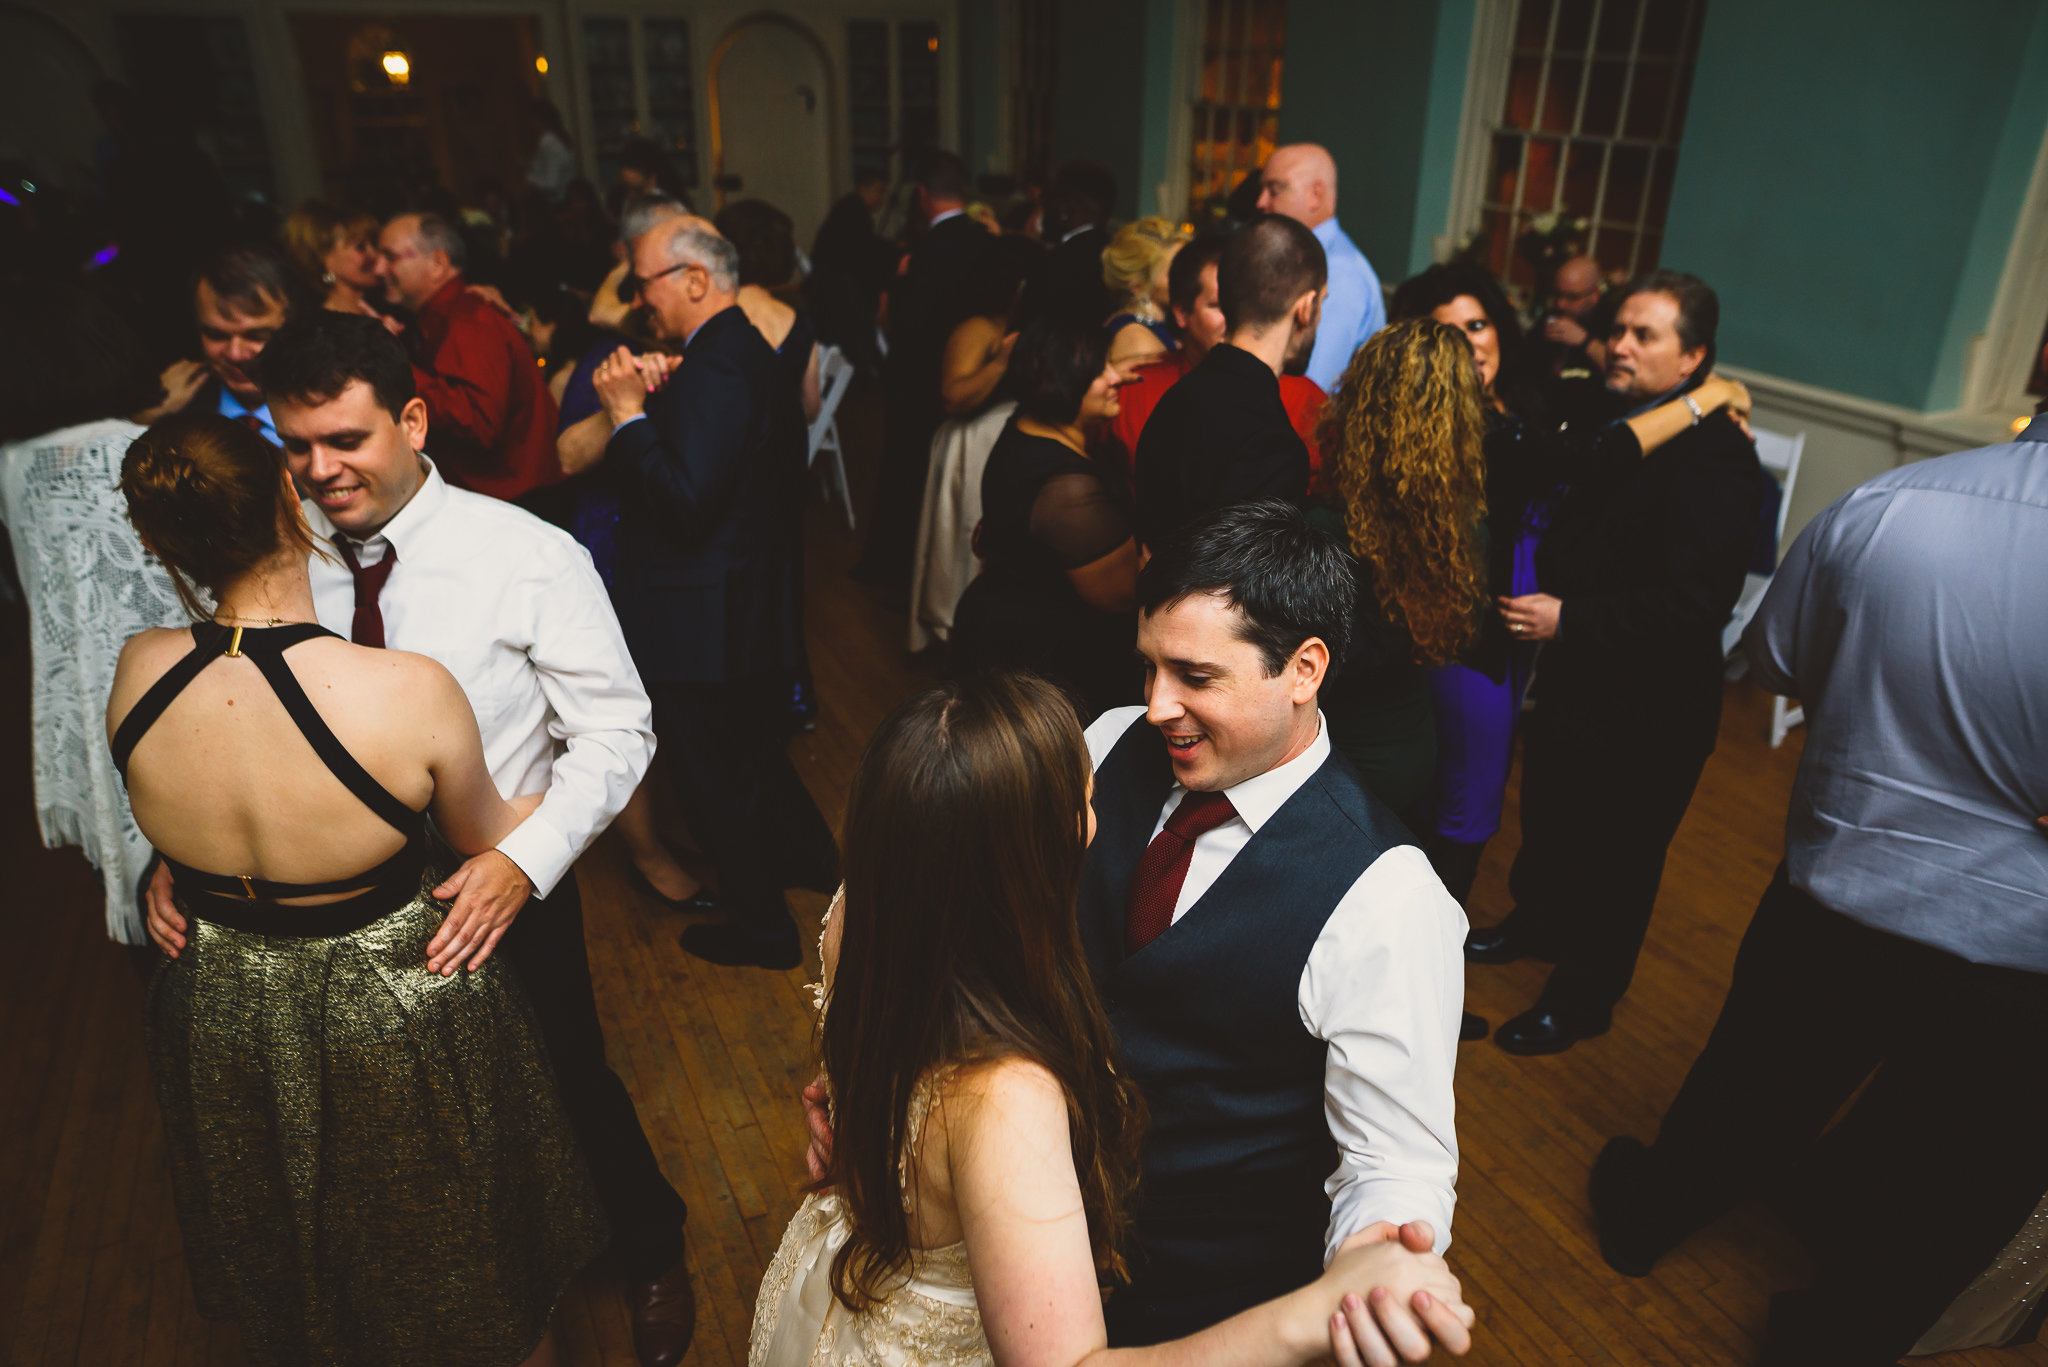 Colonial_Dames_Society_Wedding-0088.jpg